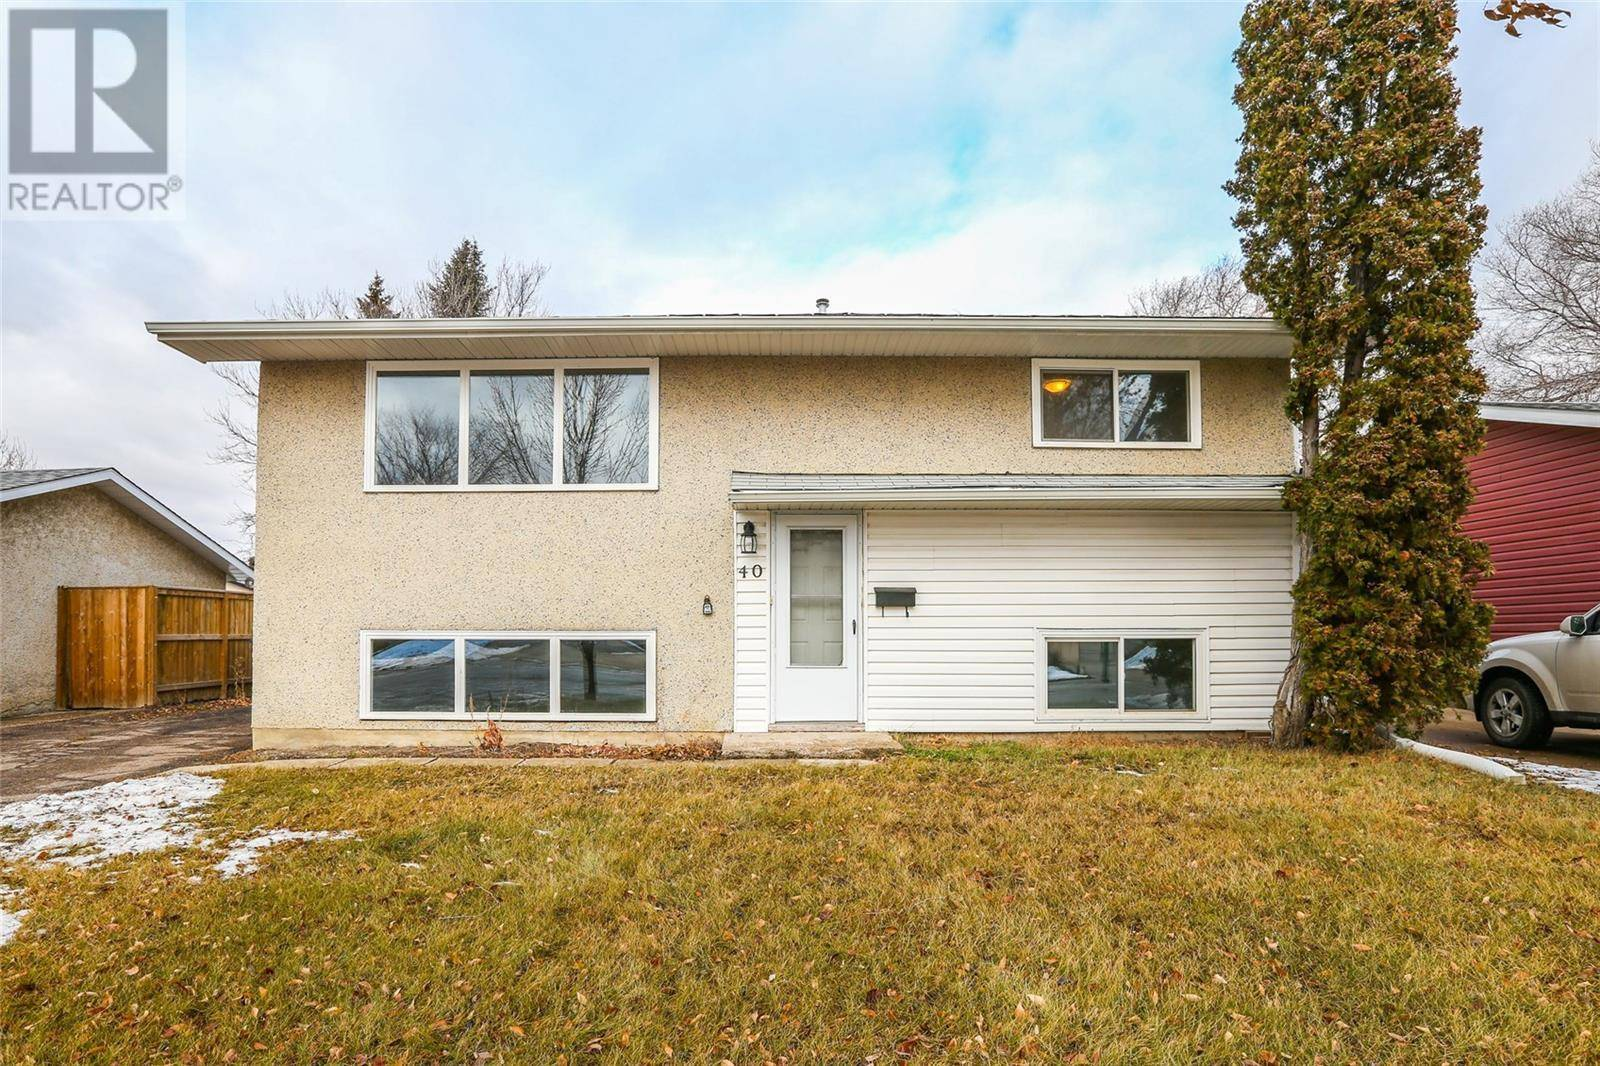 House for sale at 40 Wentworth Cres Saskatoon Saskatchewan - MLS: SK792740